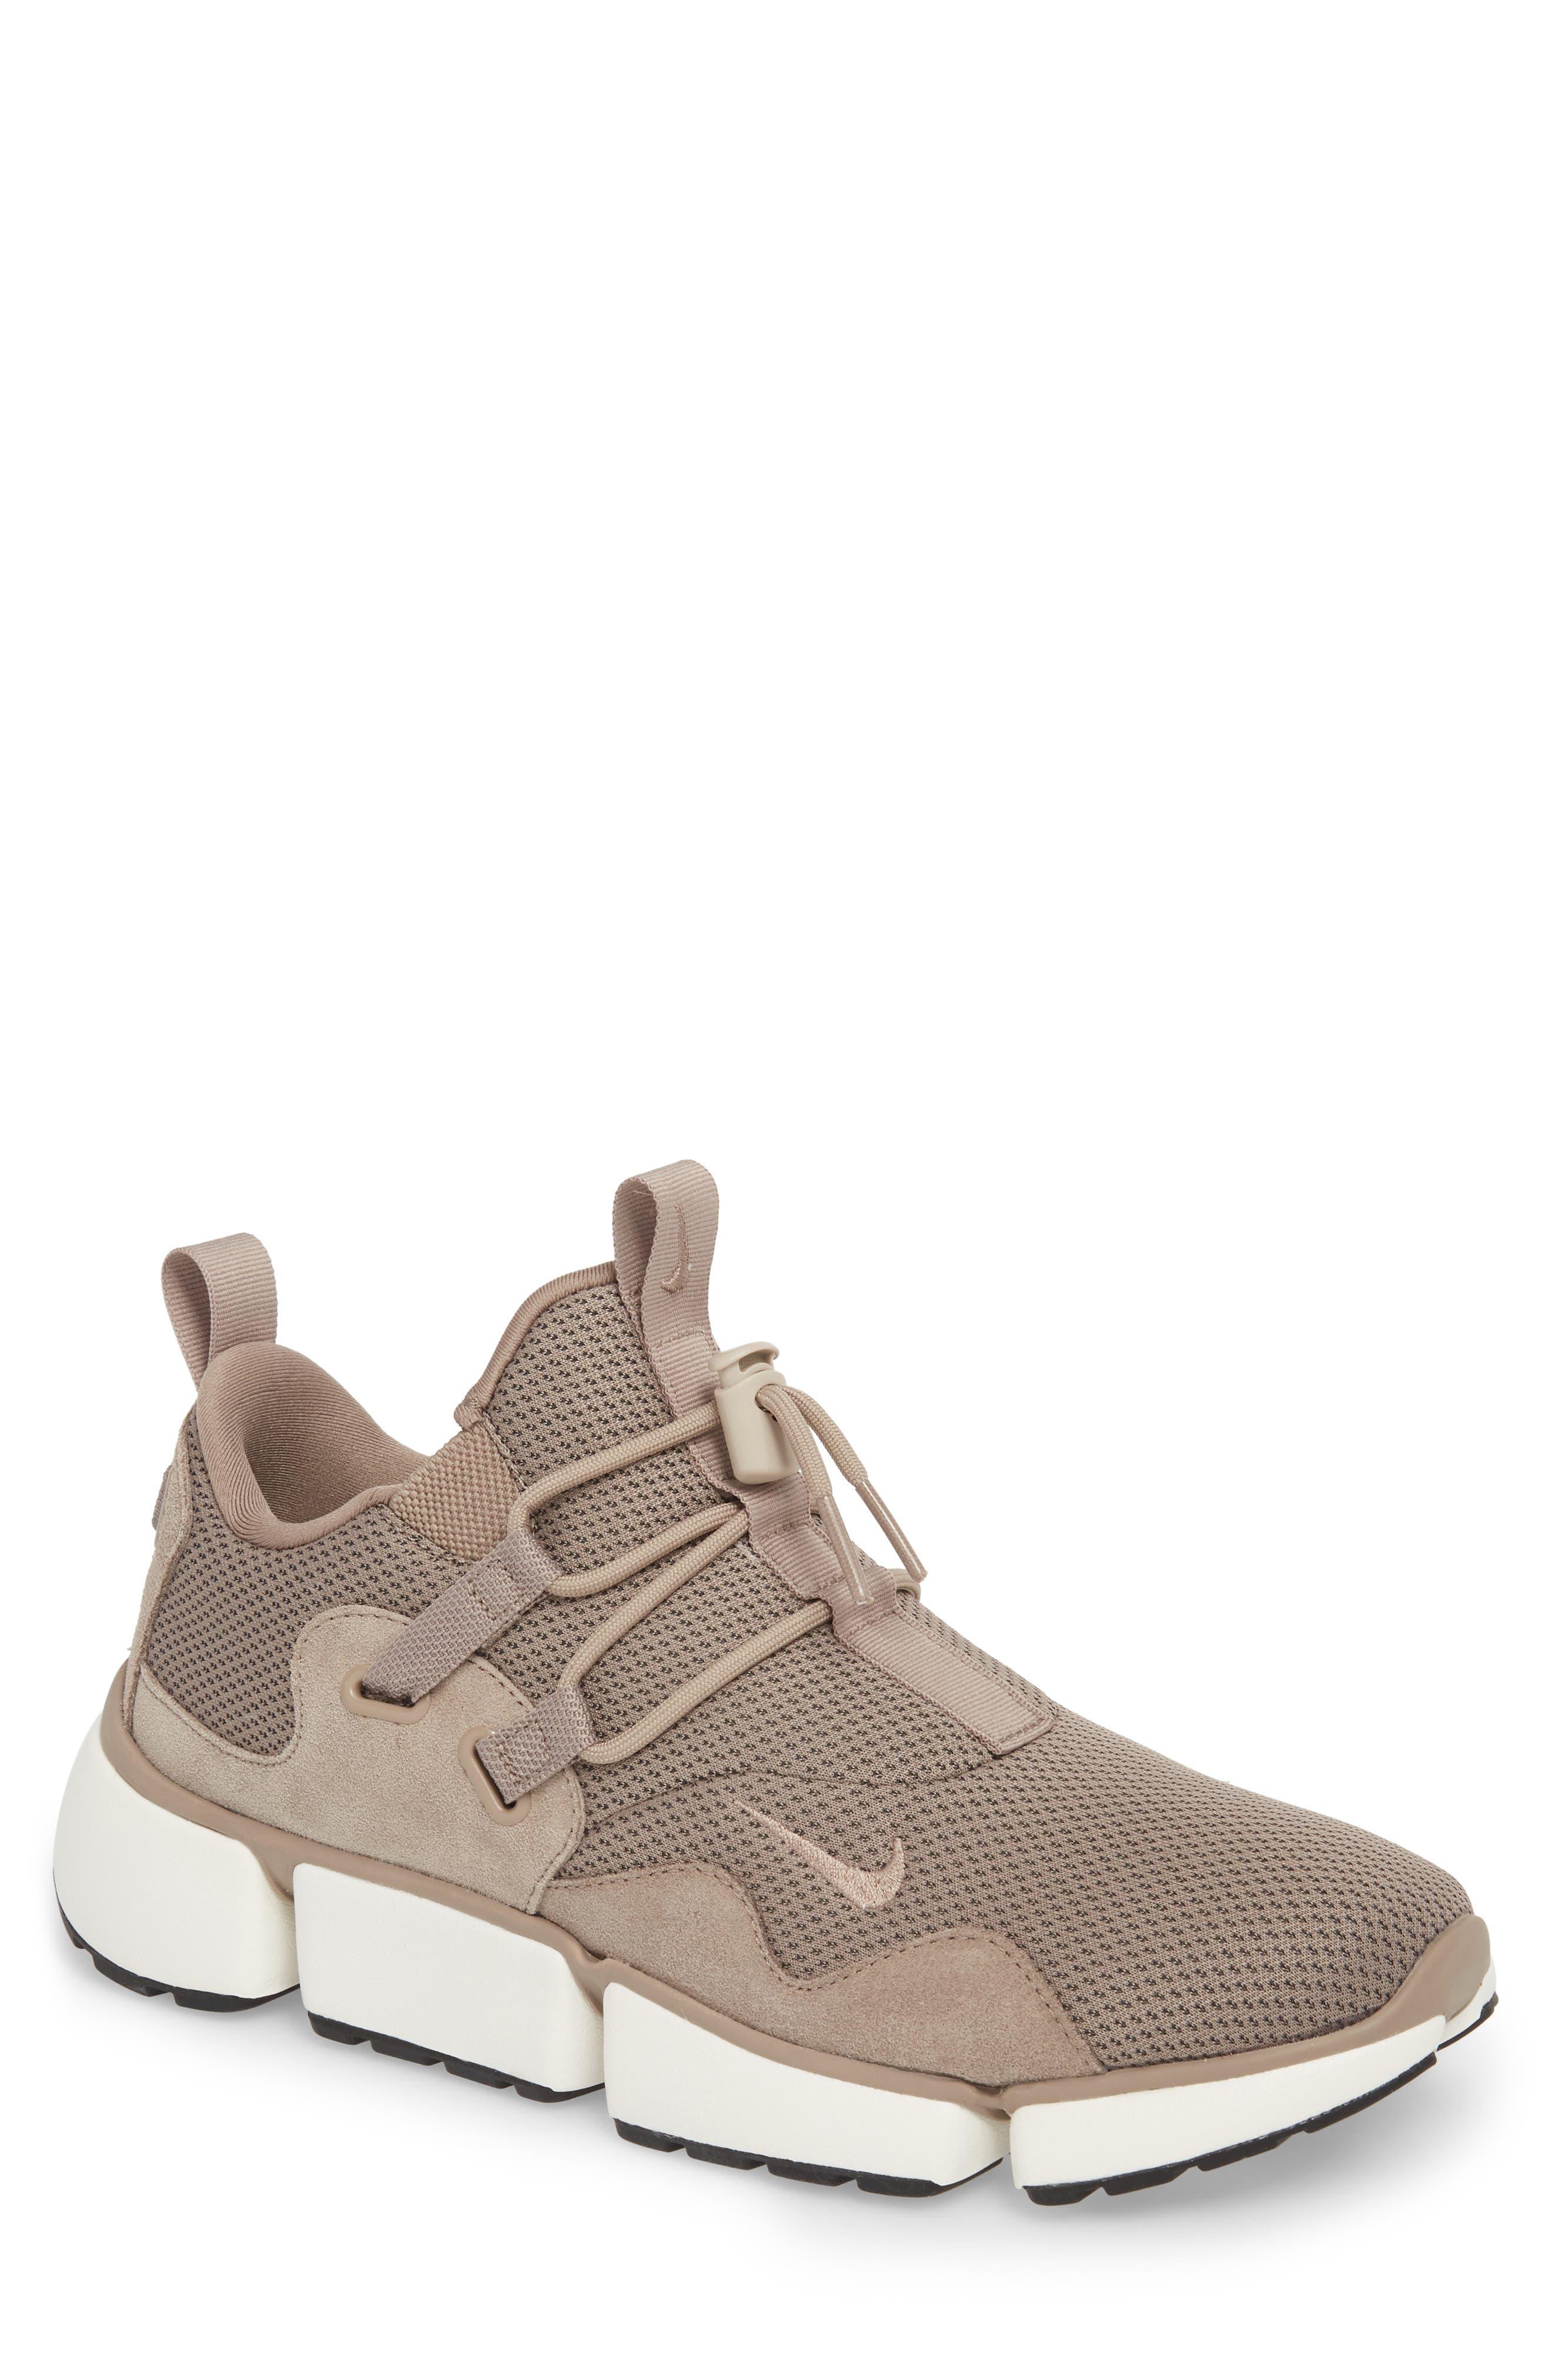 PocketKnife DM SE Sneaker,                         Main,                         color, Sepia Stone/ Sail/ Black